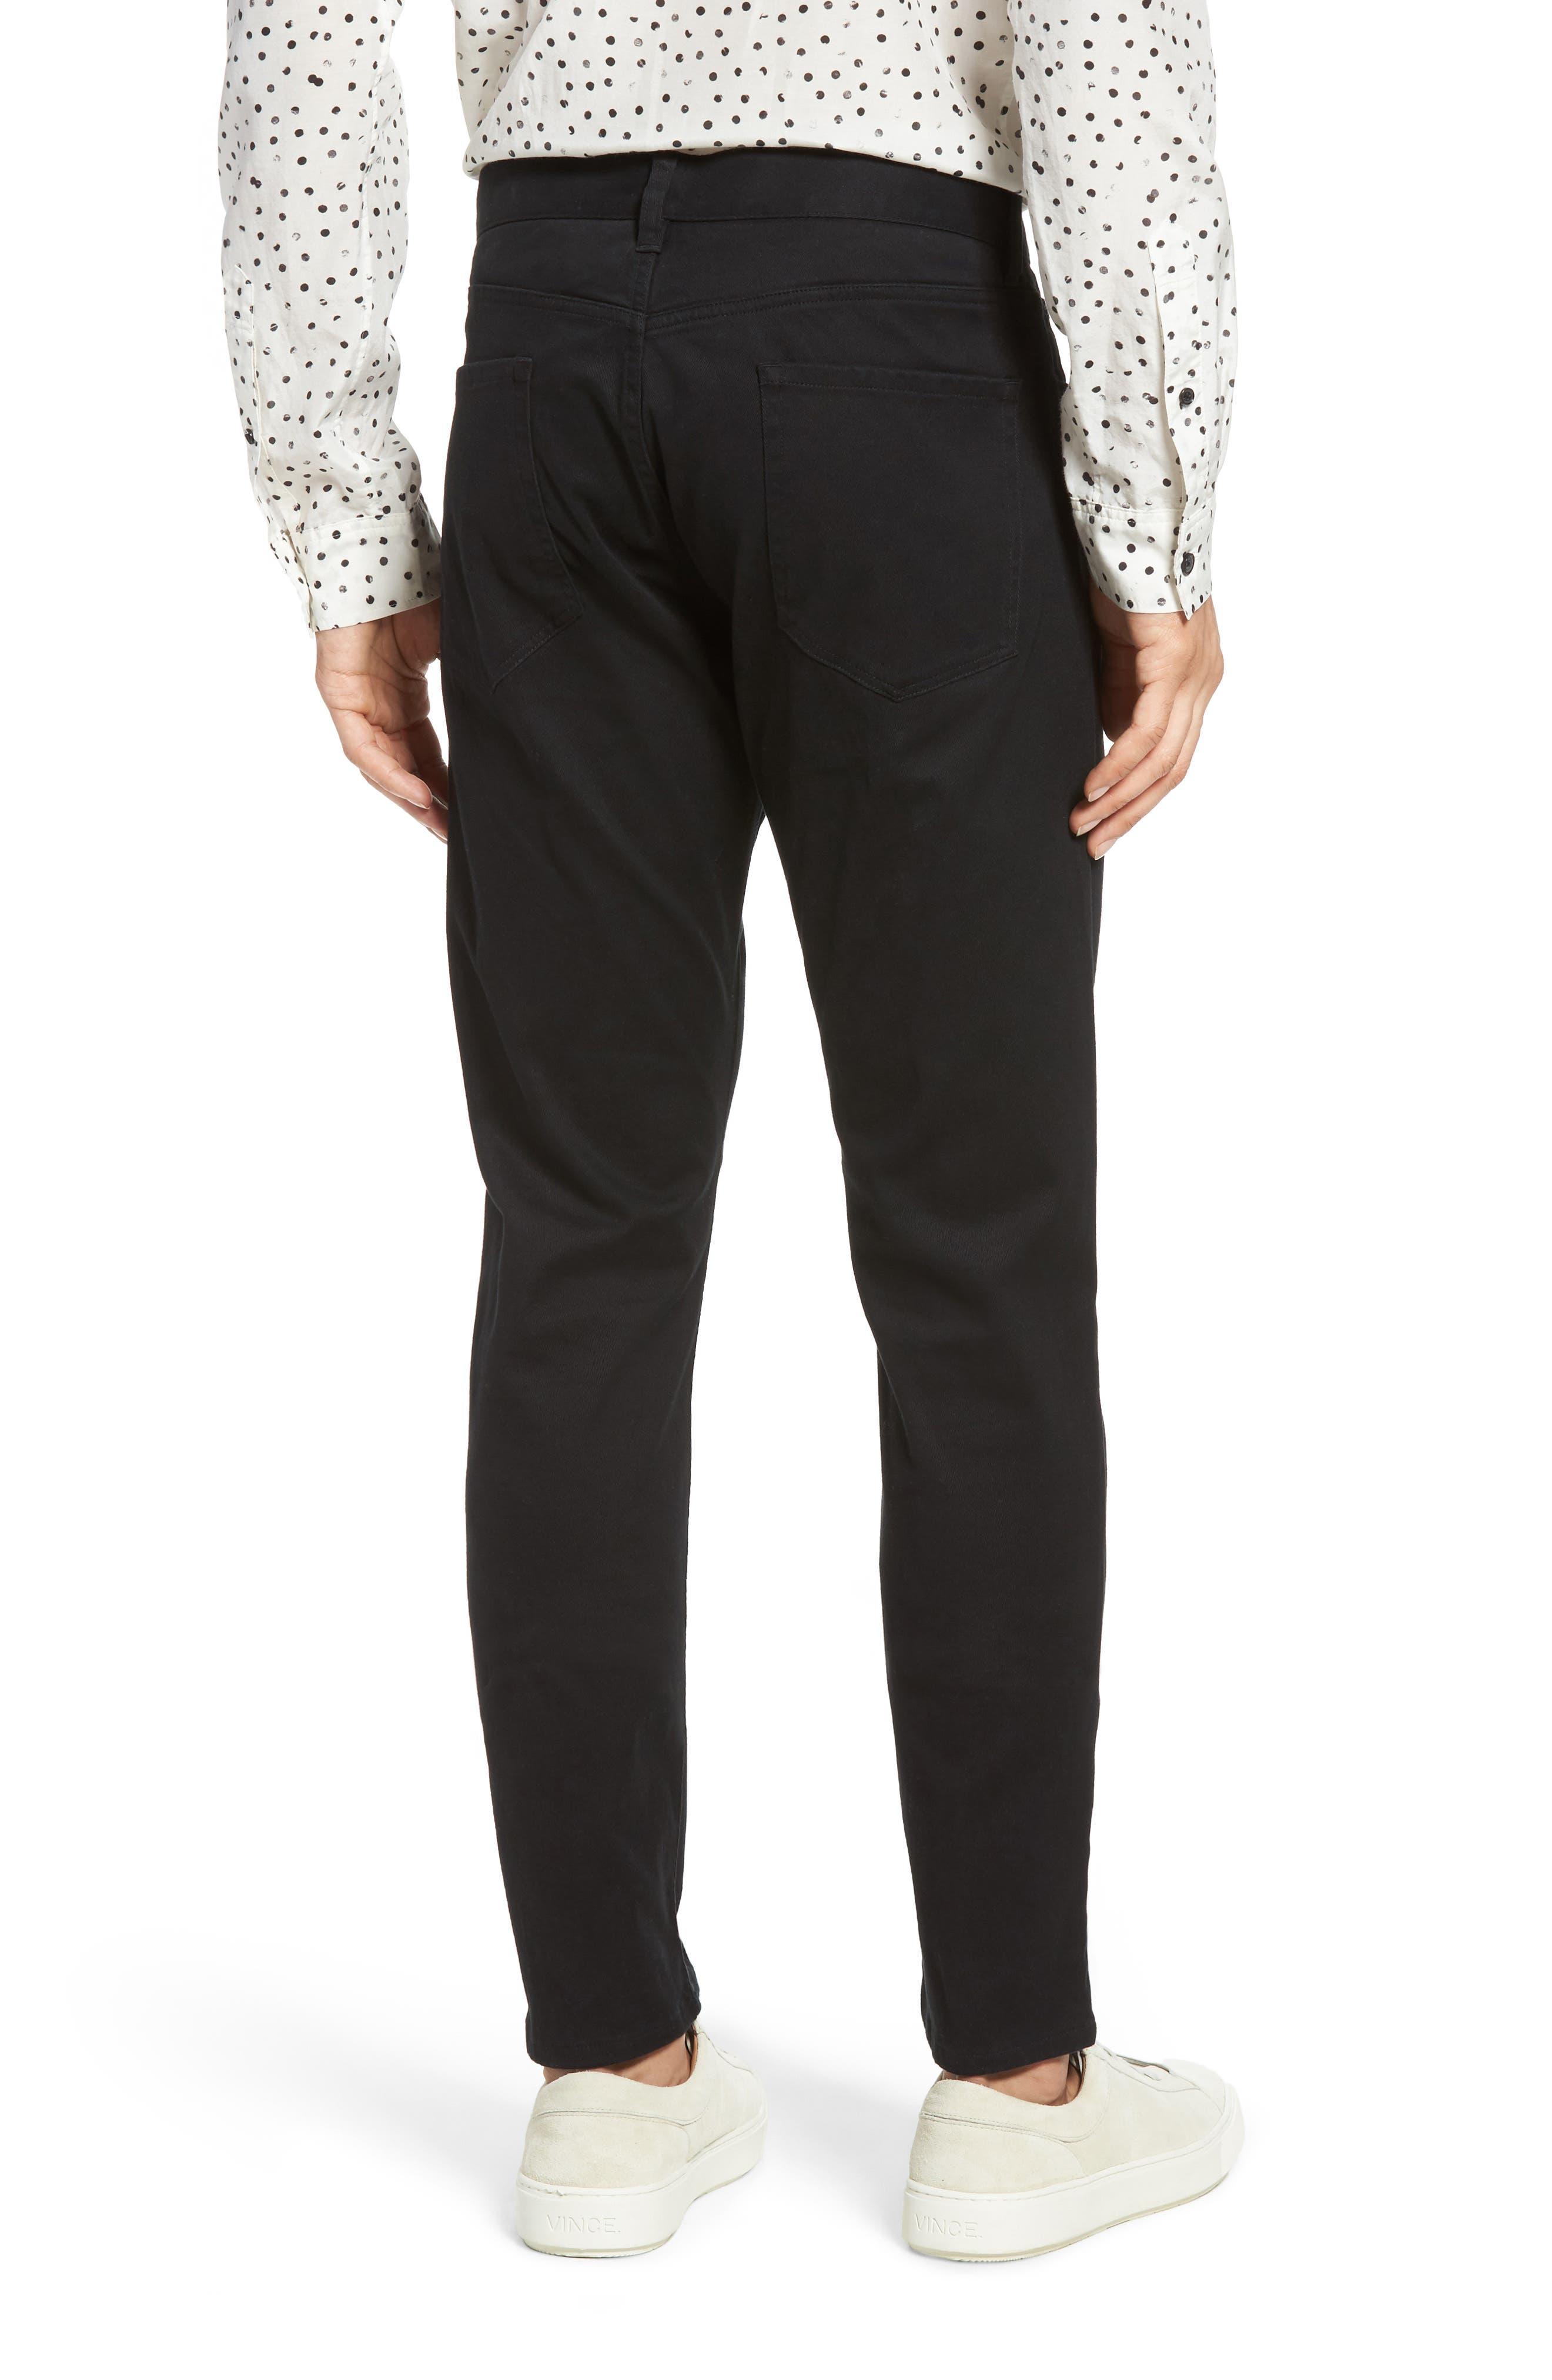 VINCE,                             Soho Slim Fit Five-Pocket Pants,                             Alternate thumbnail 2, color,                             001